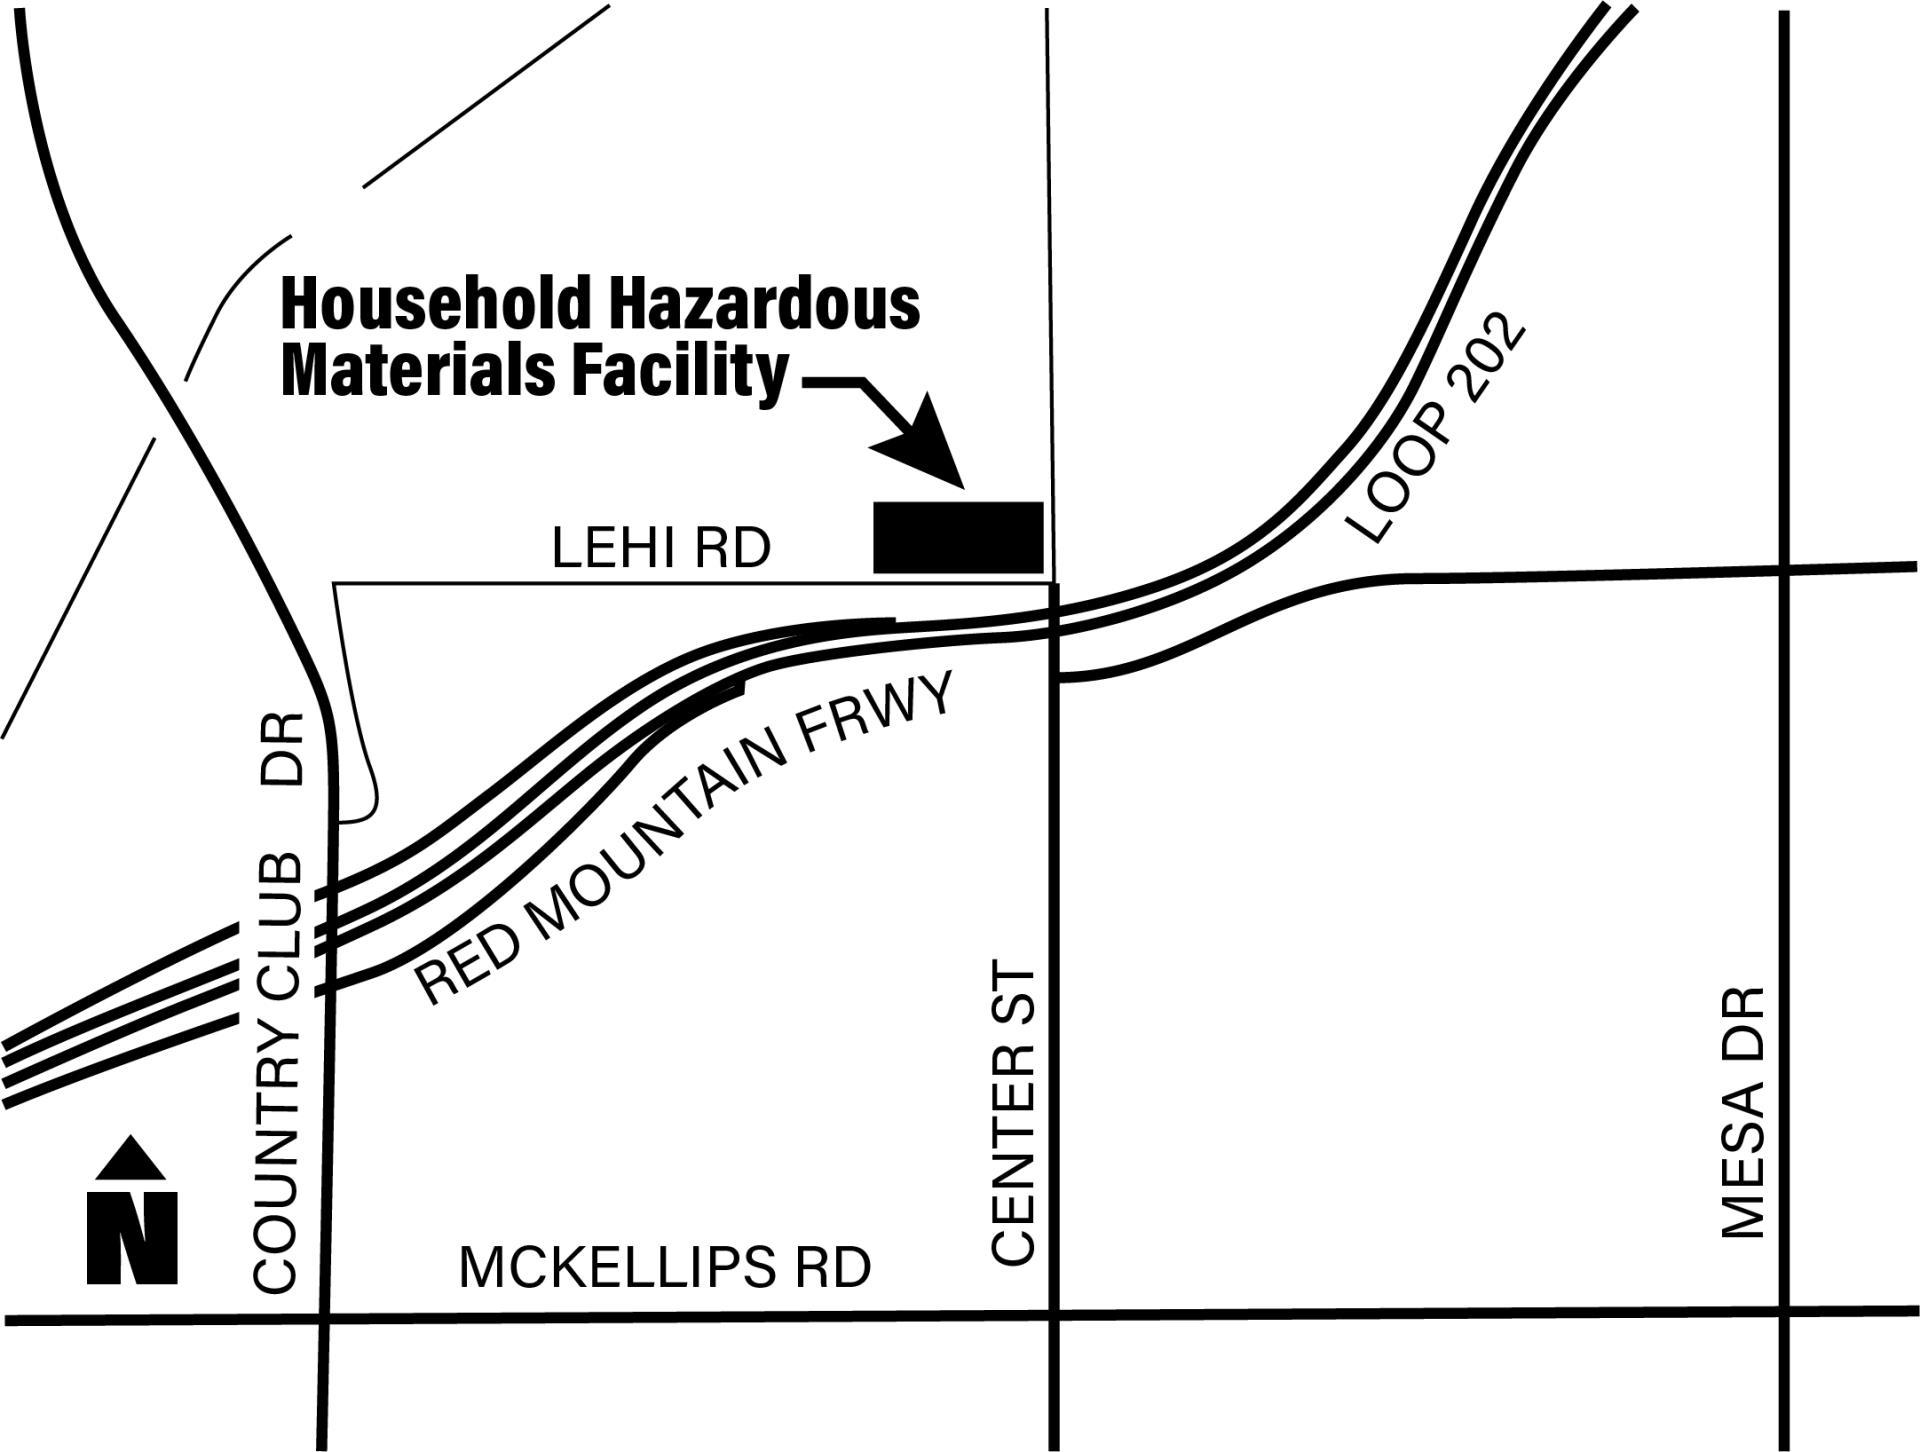 HHWF Map